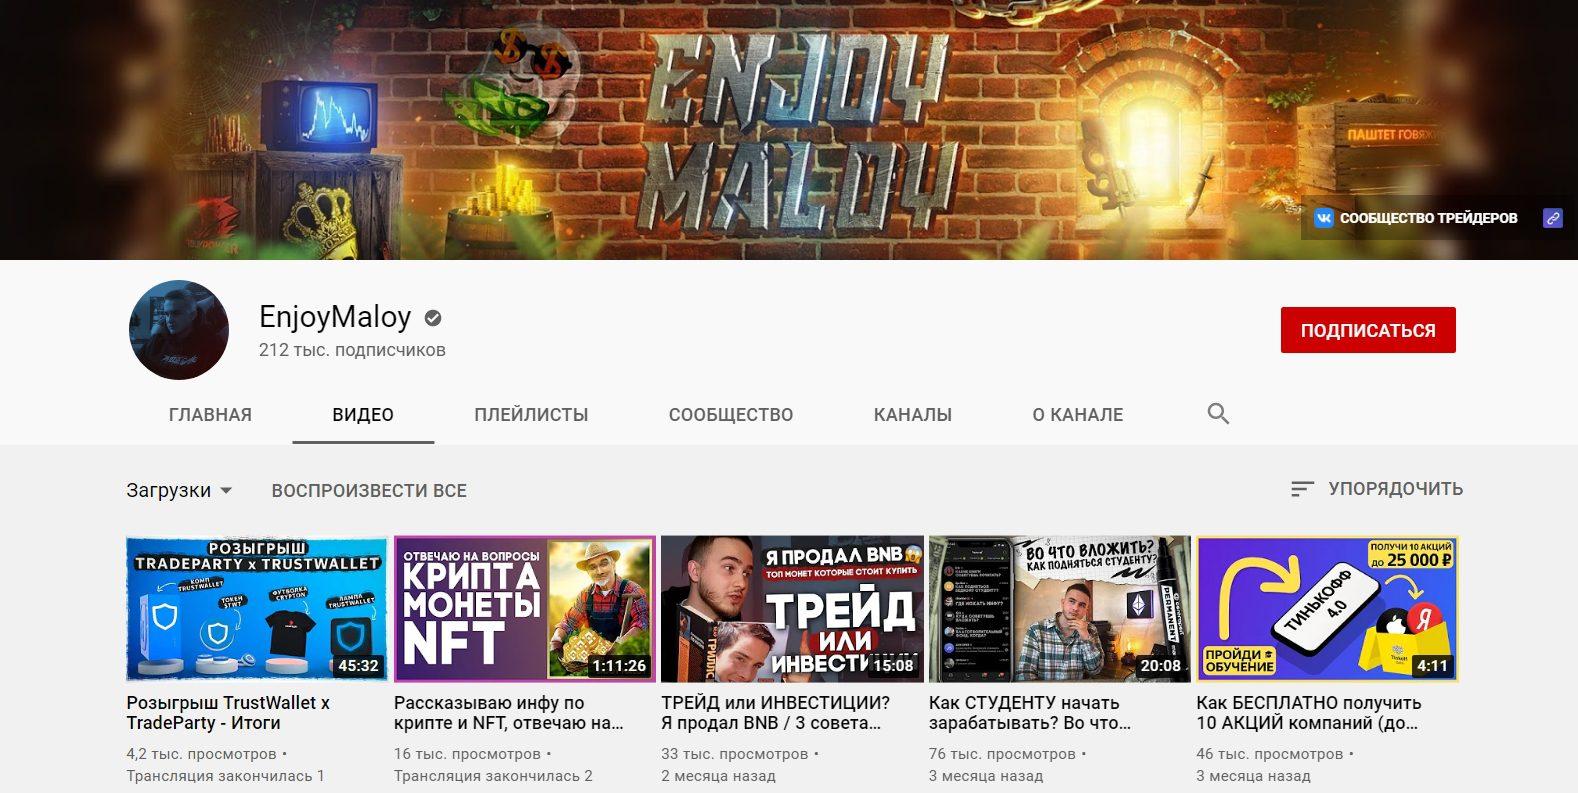 YouTube-канал Enjoy Maloy